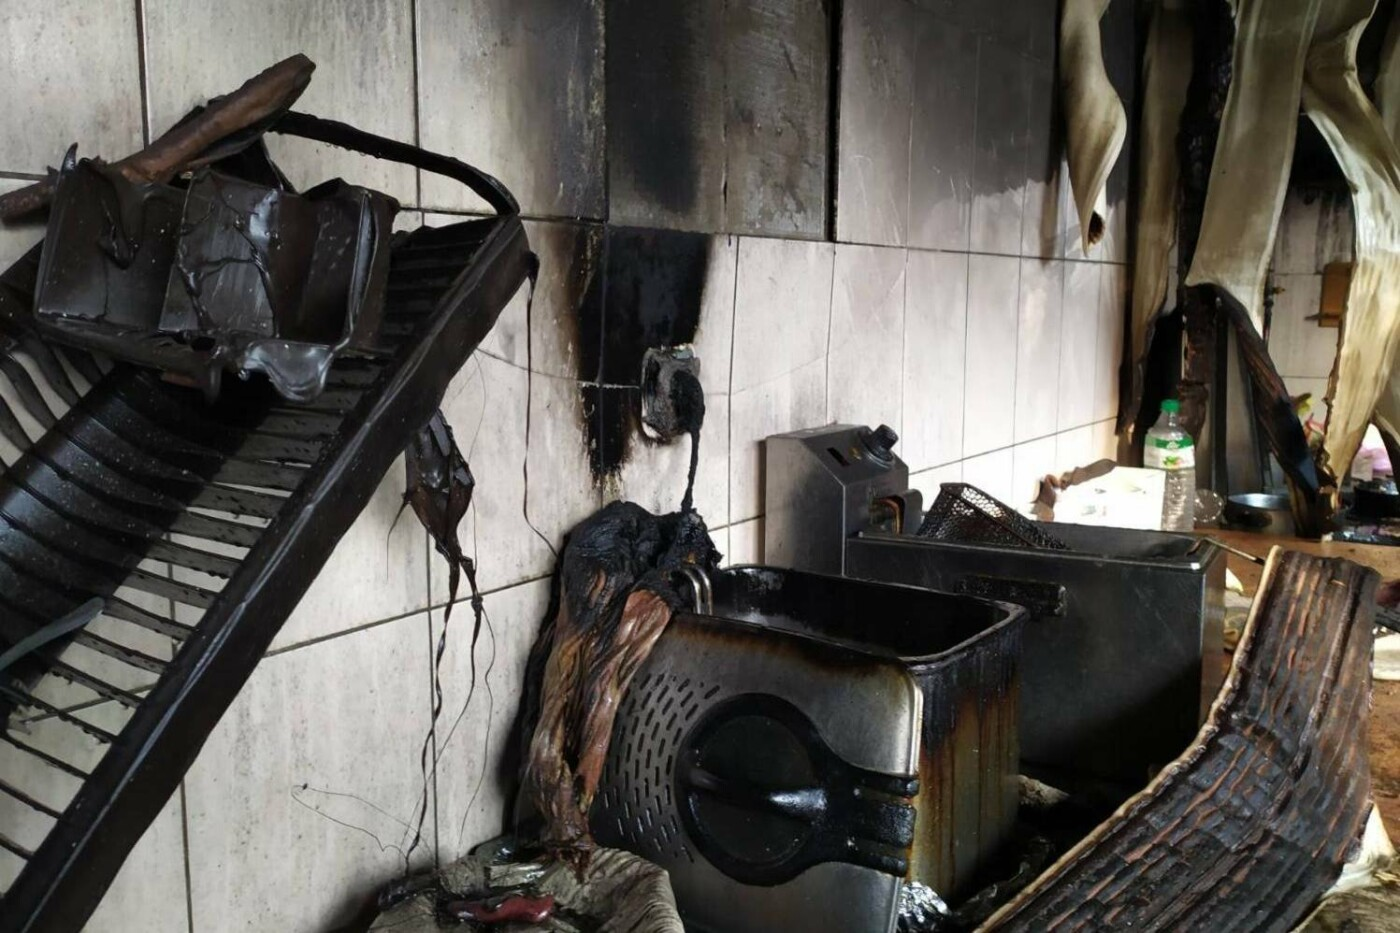 В селе под Харьковом горело кафе. Пострадала одна из сотрудниц, - ФОТО, фото-1